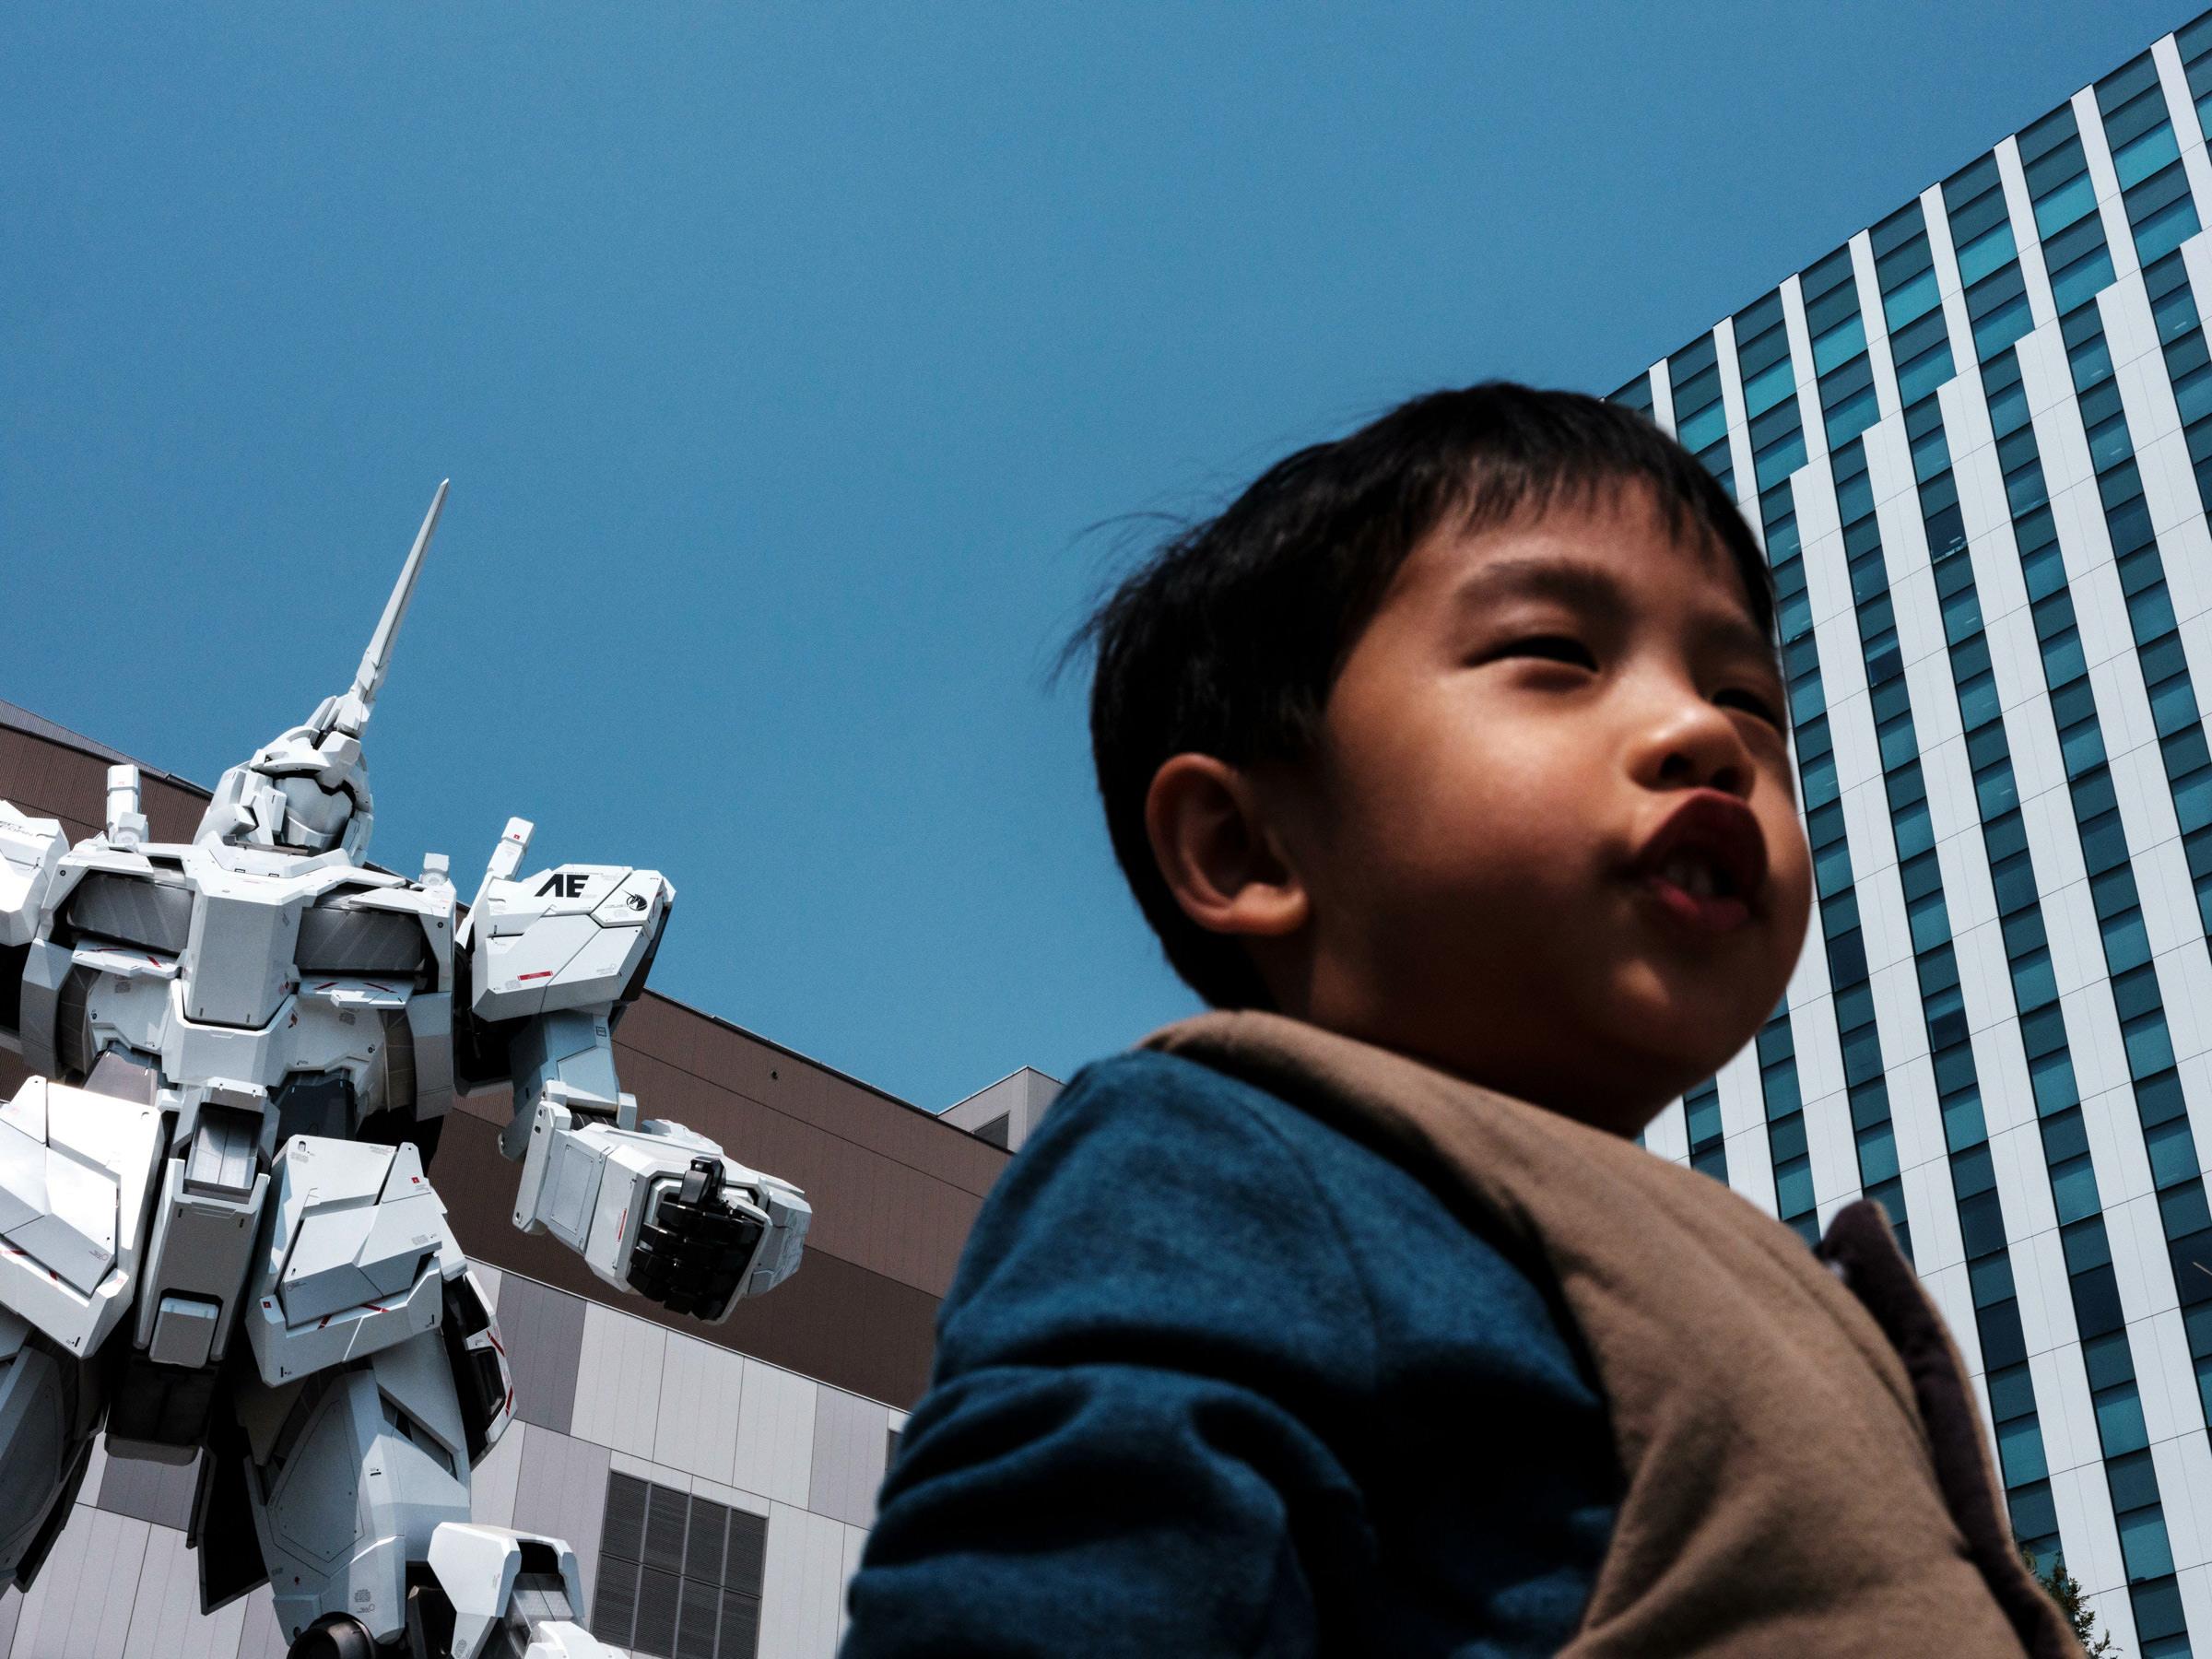 Fujifilm-GFX-Japan-Street-Photography-7